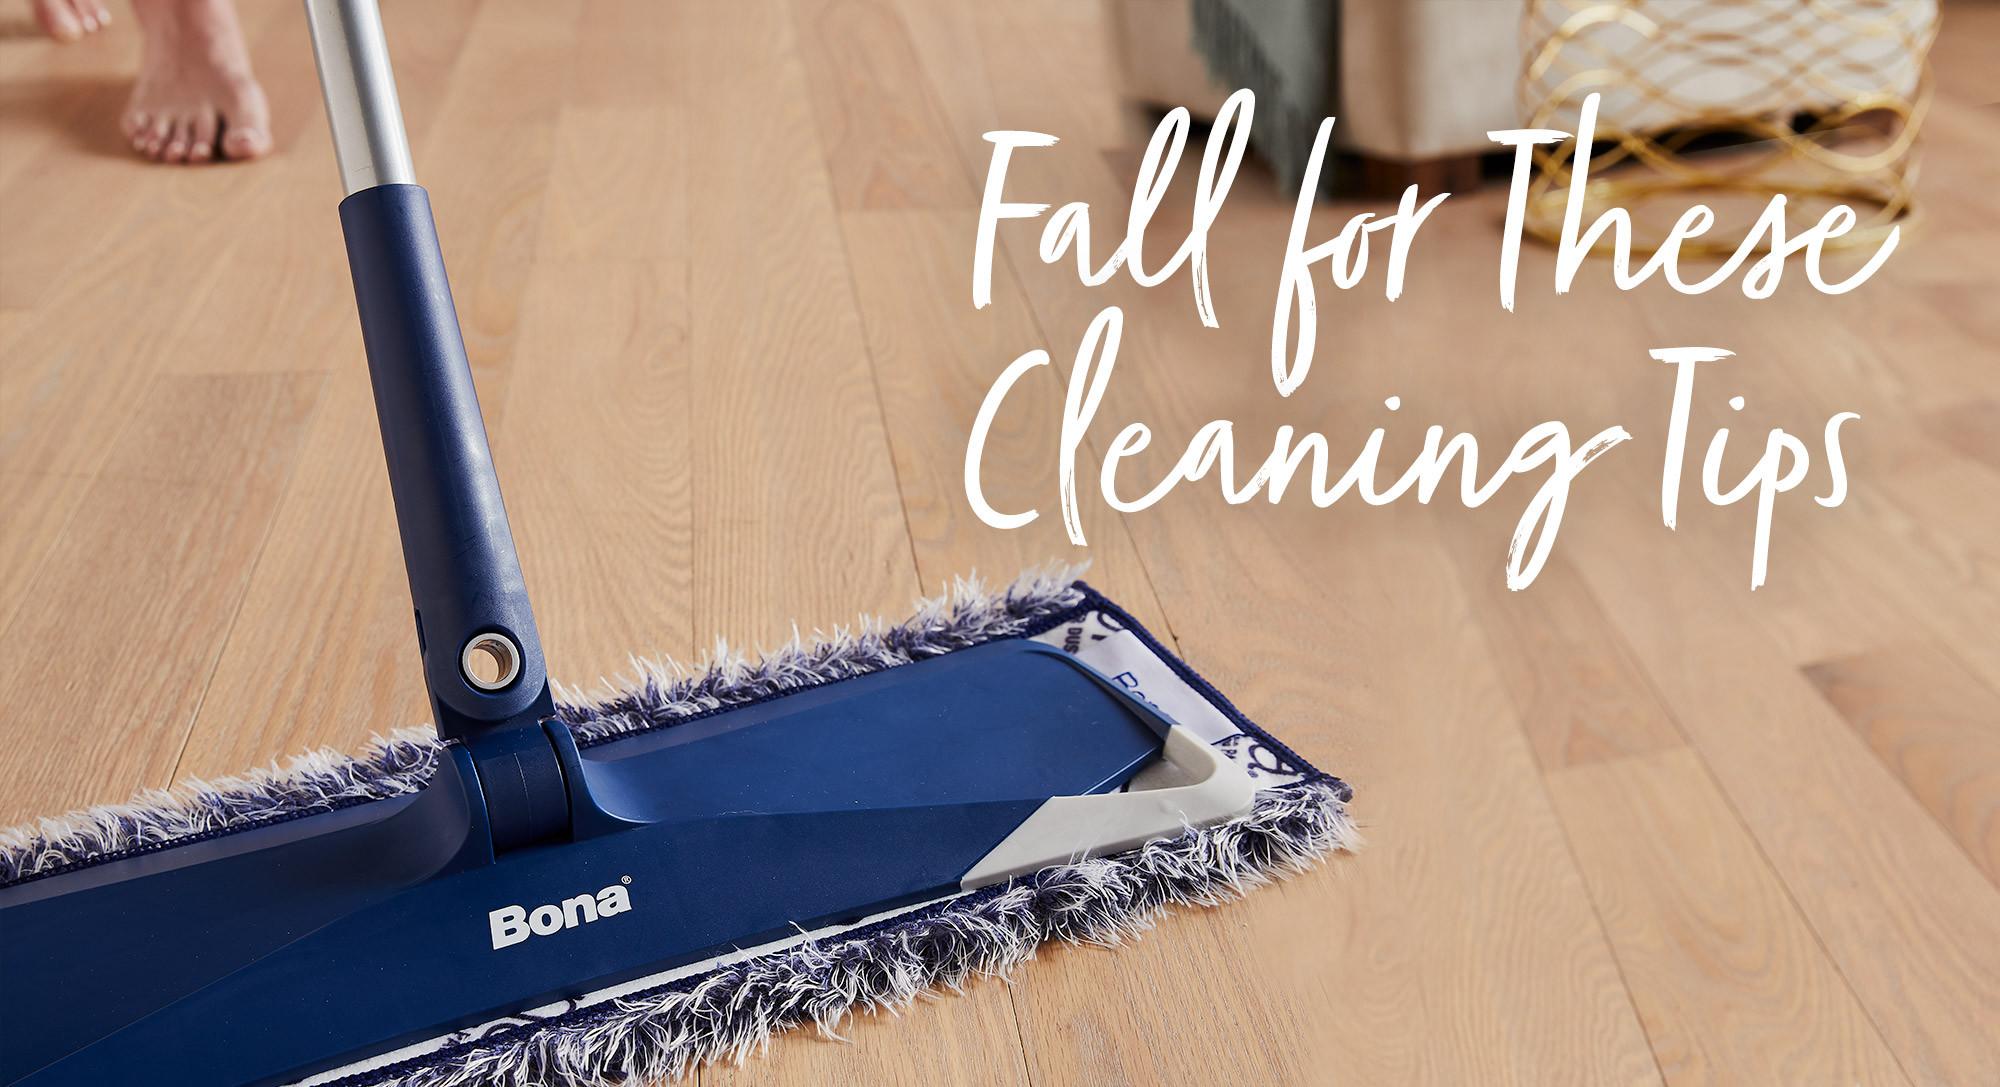 Restoring Hardwood Floors Under Carpet Of Home Bona Us Inside Fall Feature2